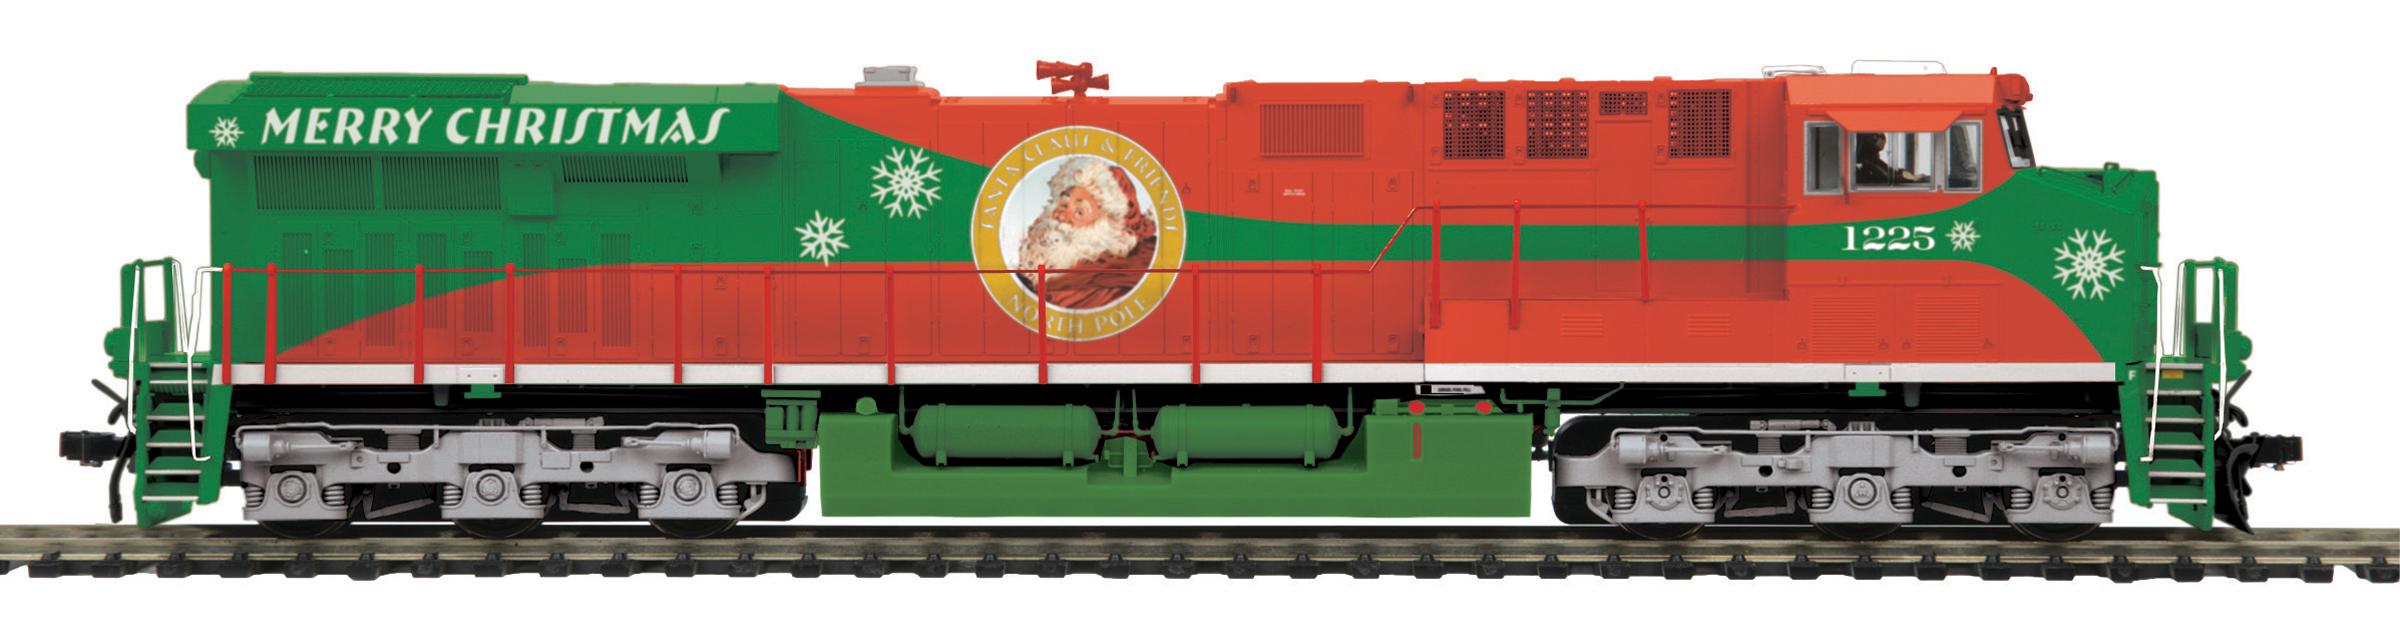 MTH 80-2351-1 GE ES44AC Proto Sound 3.0 & DCC Merry Christmas #1225